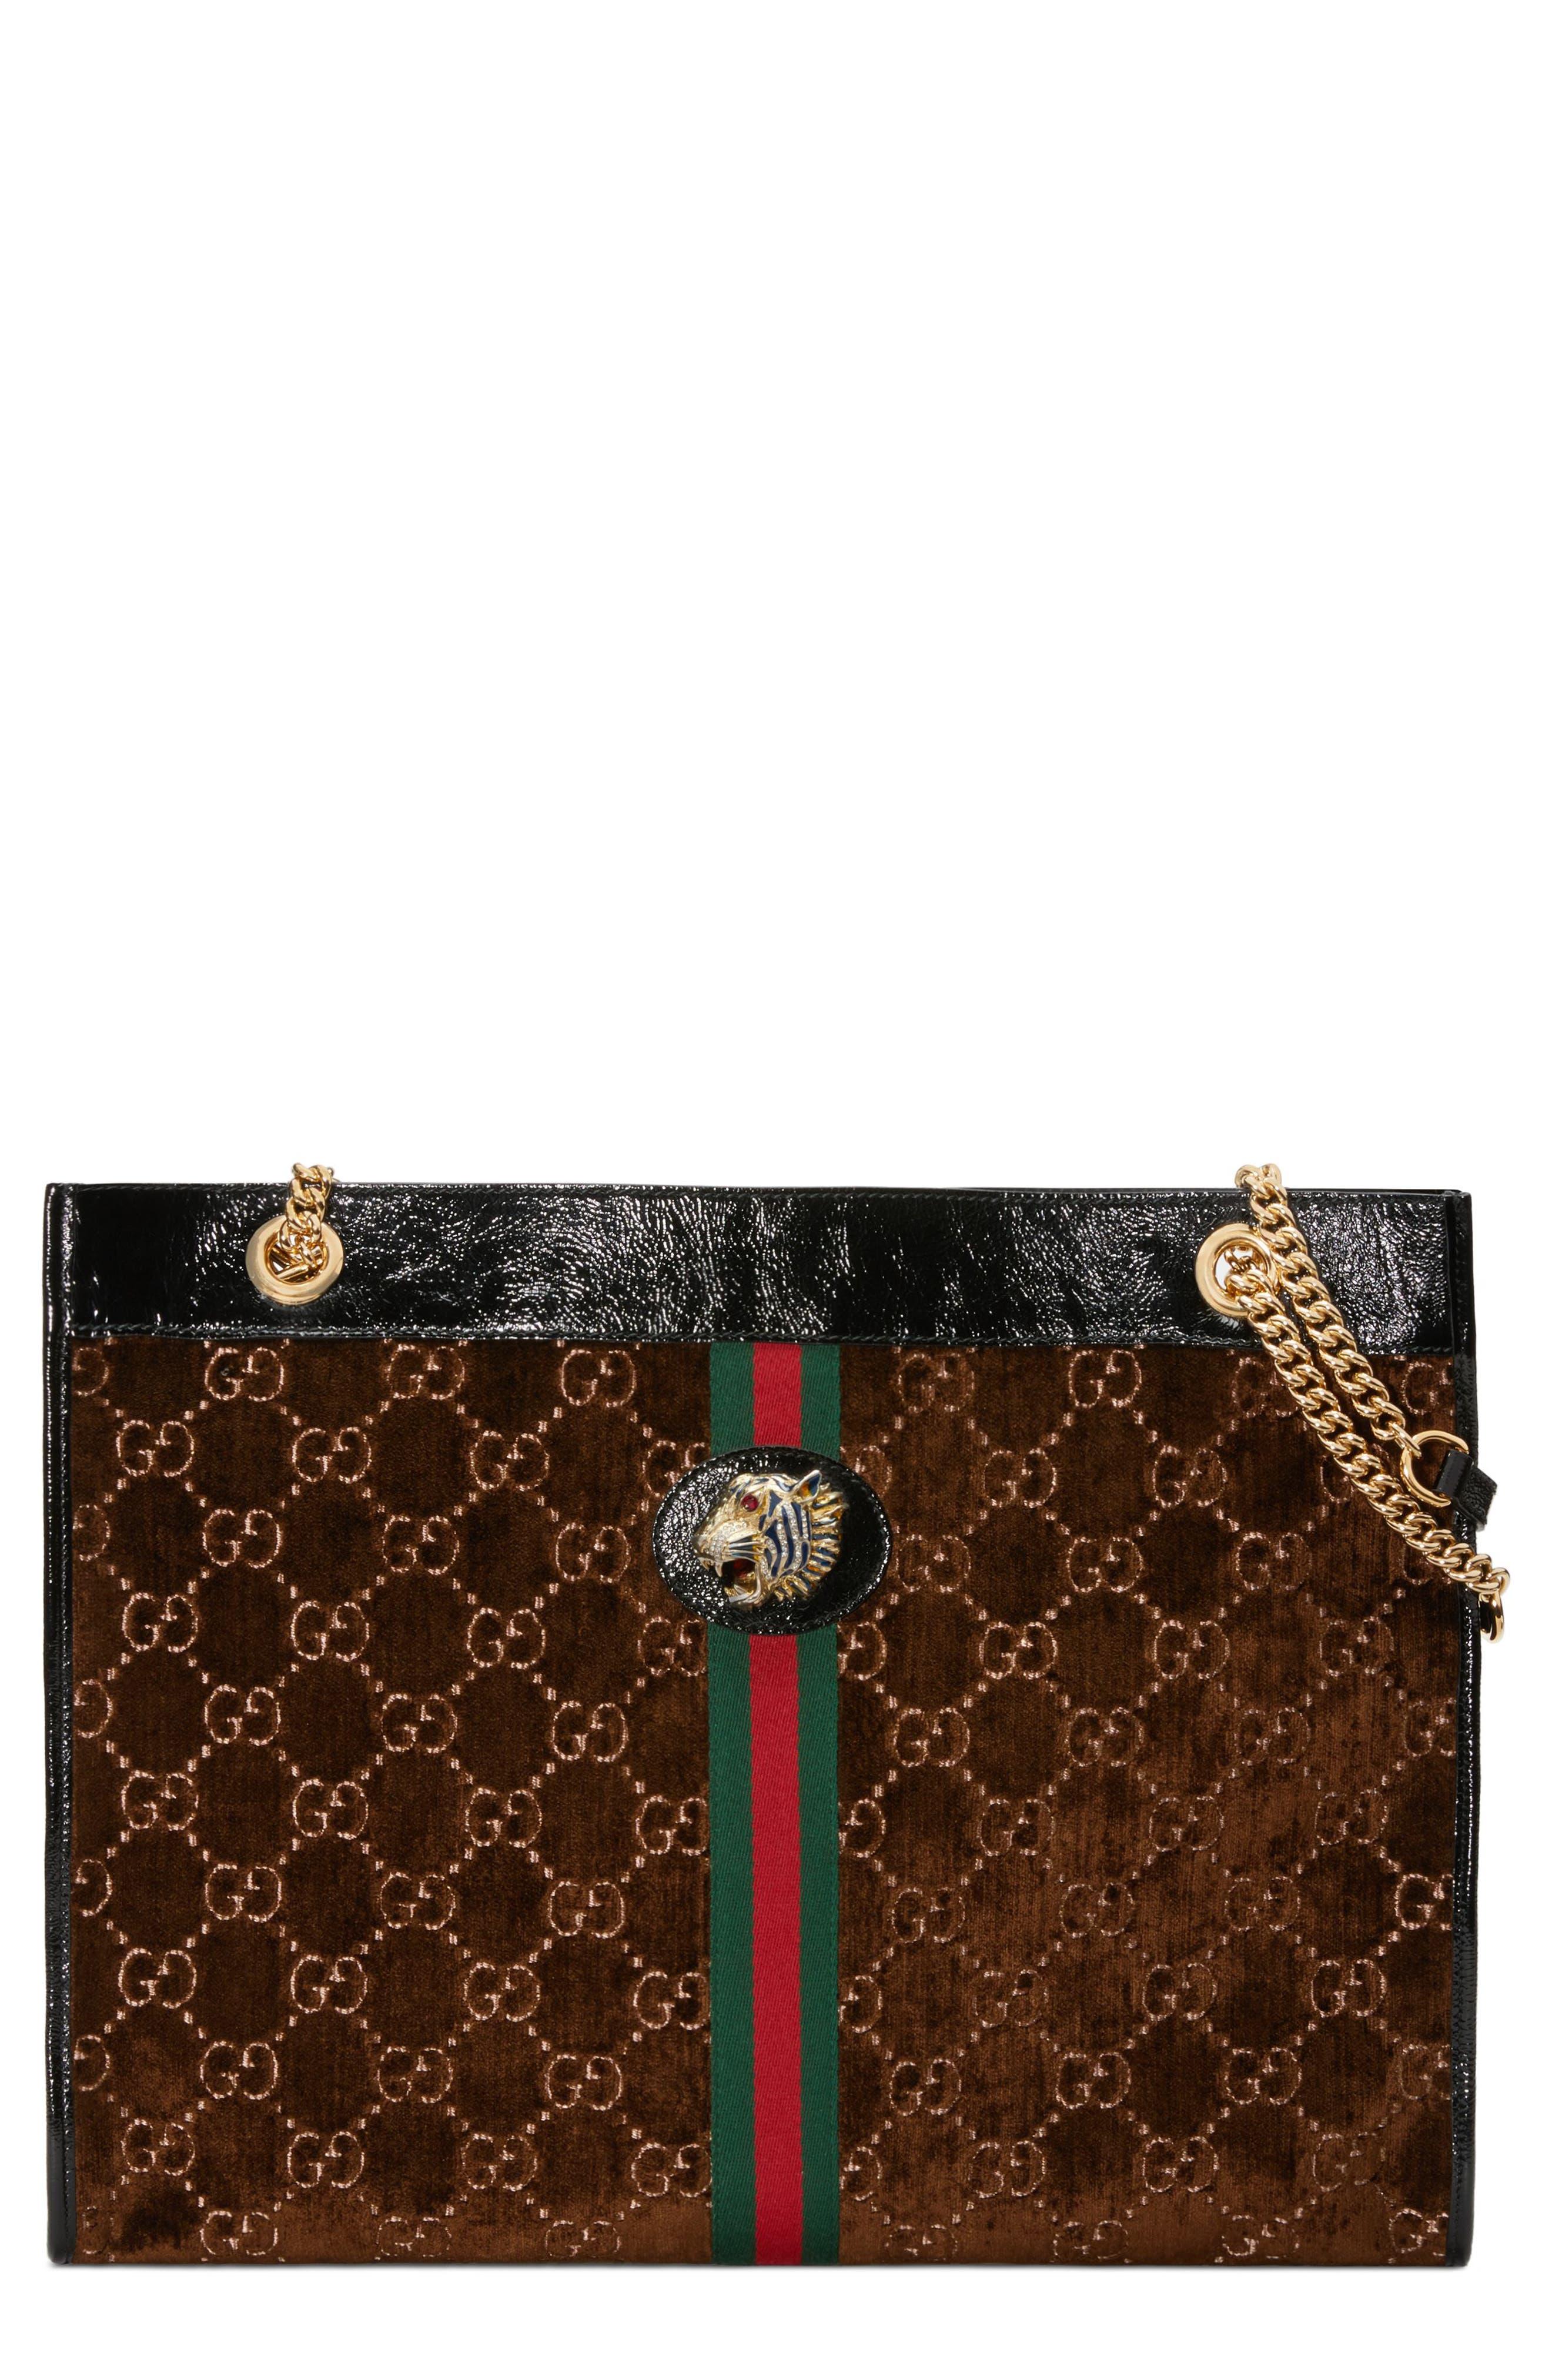 Gucci Large Linea Rajah GG Velvet Tote